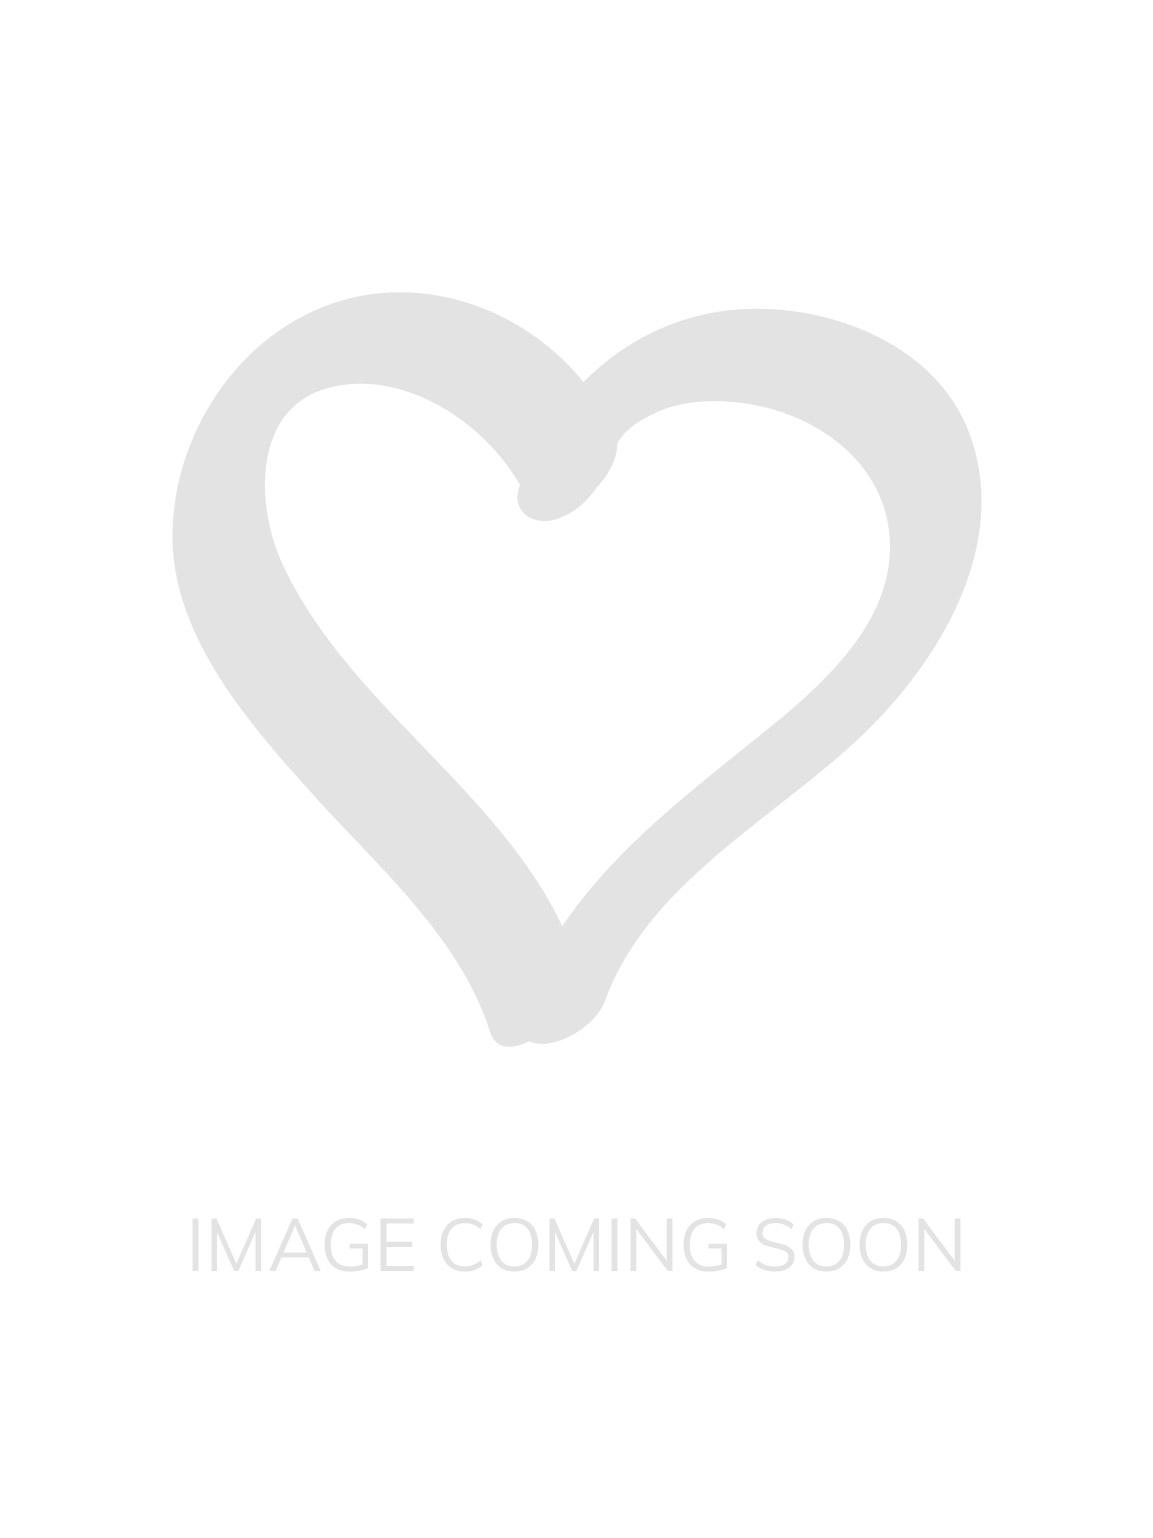 517ce2f9351ec Flower Elegance Full Cup Bra - Orchid Purple